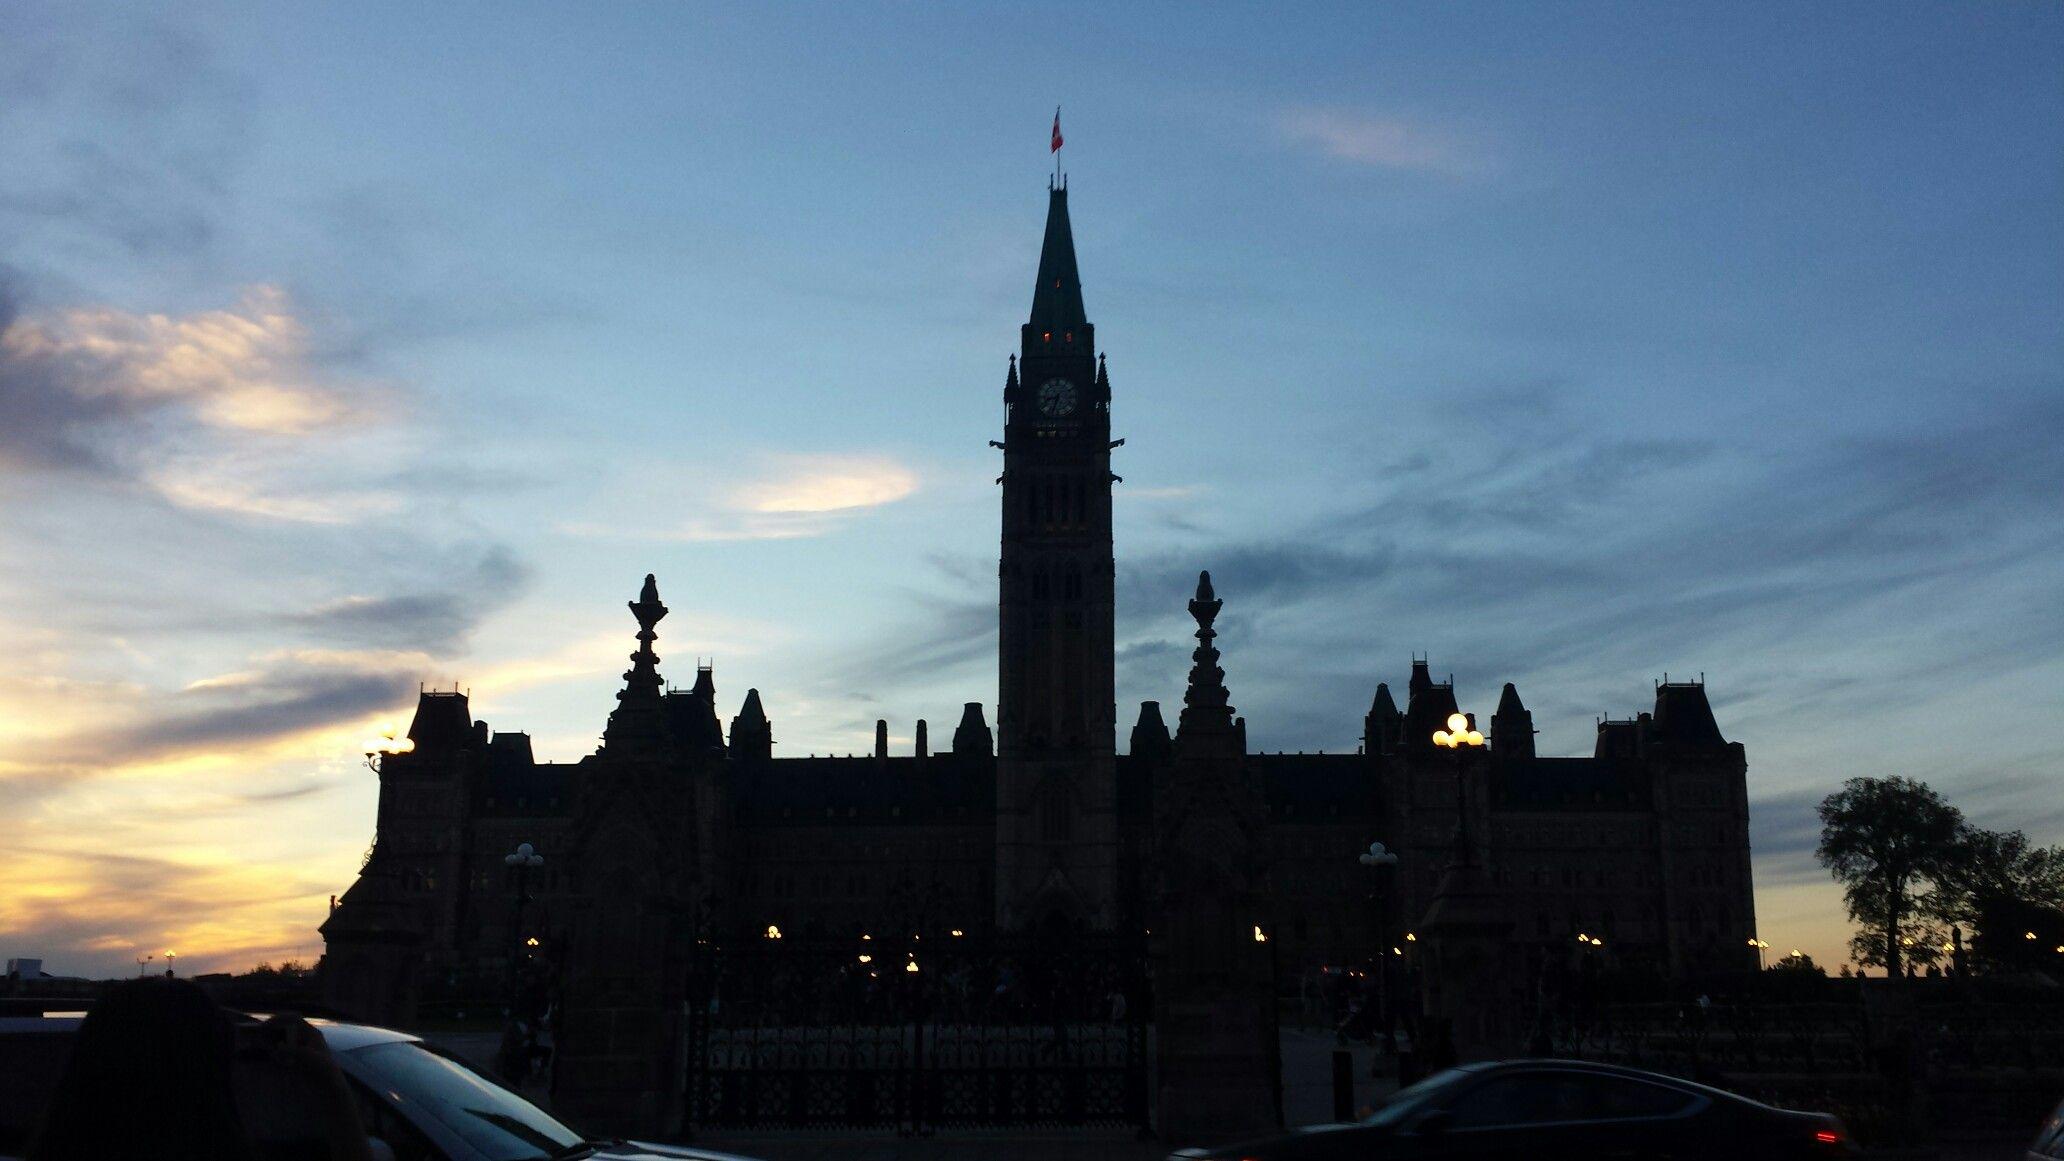 In Ottawa